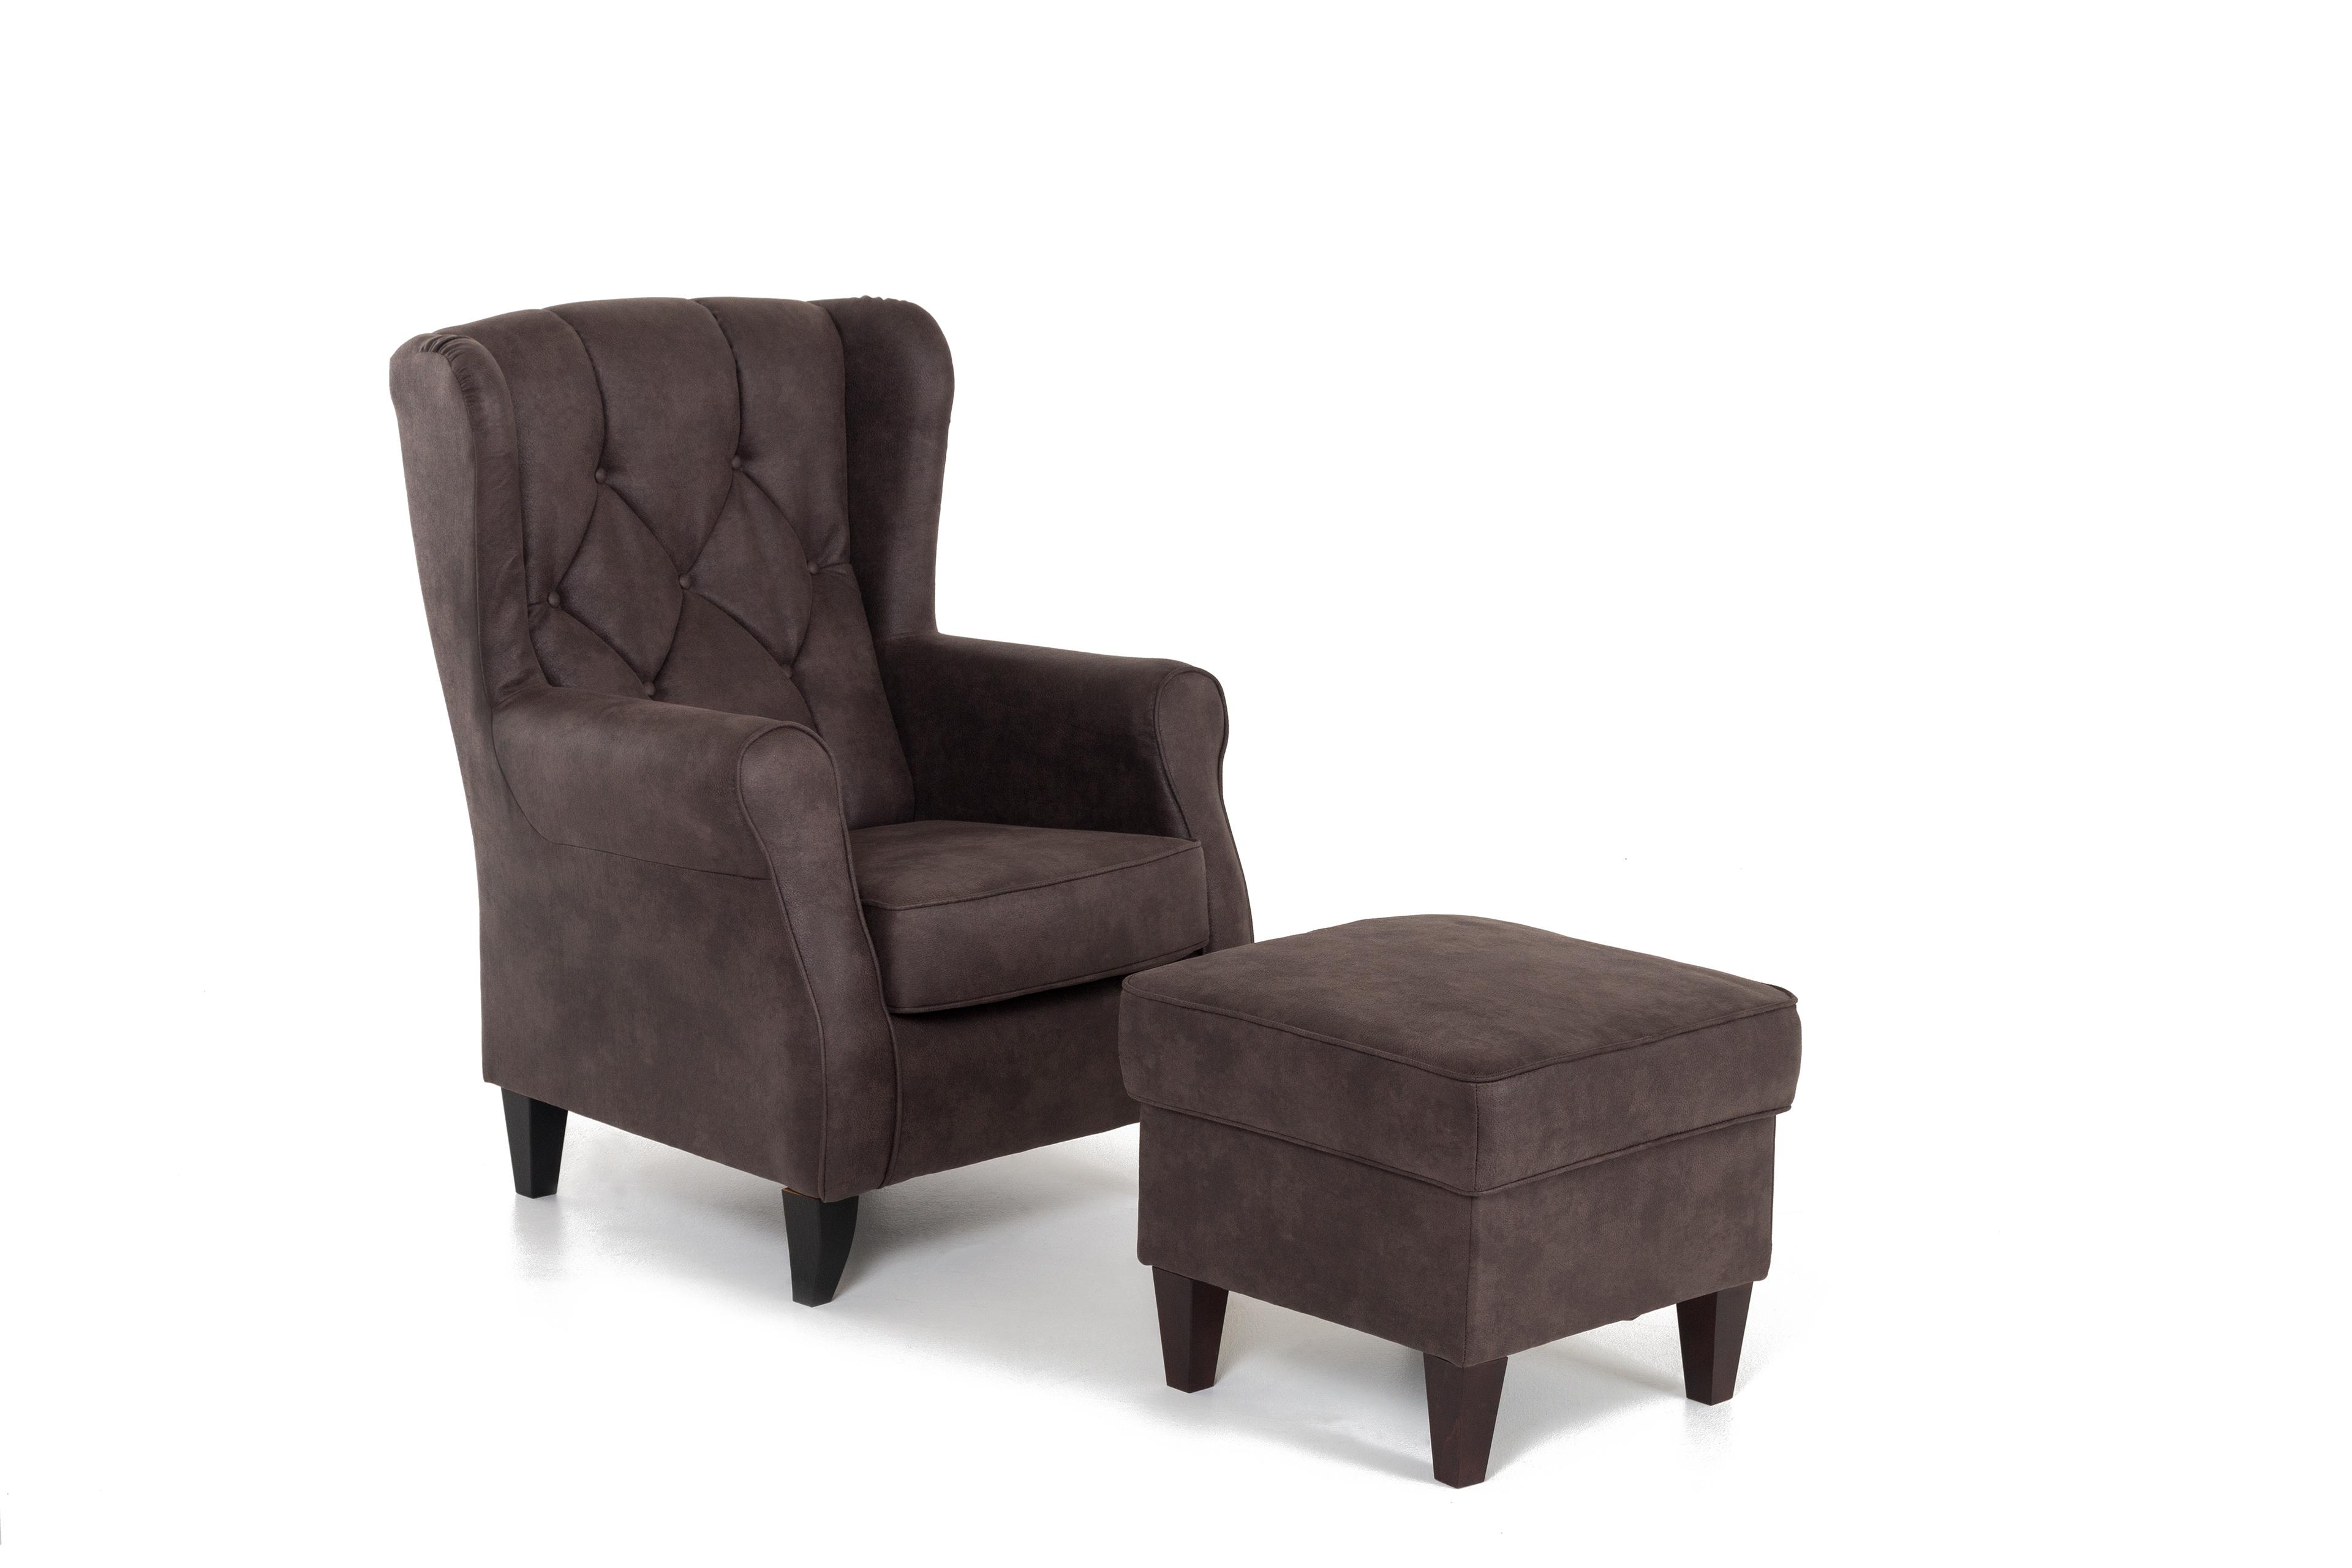 sessel sherman braun von dfm polsterm bel m bel letz ihr online shop. Black Bedroom Furniture Sets. Home Design Ideas